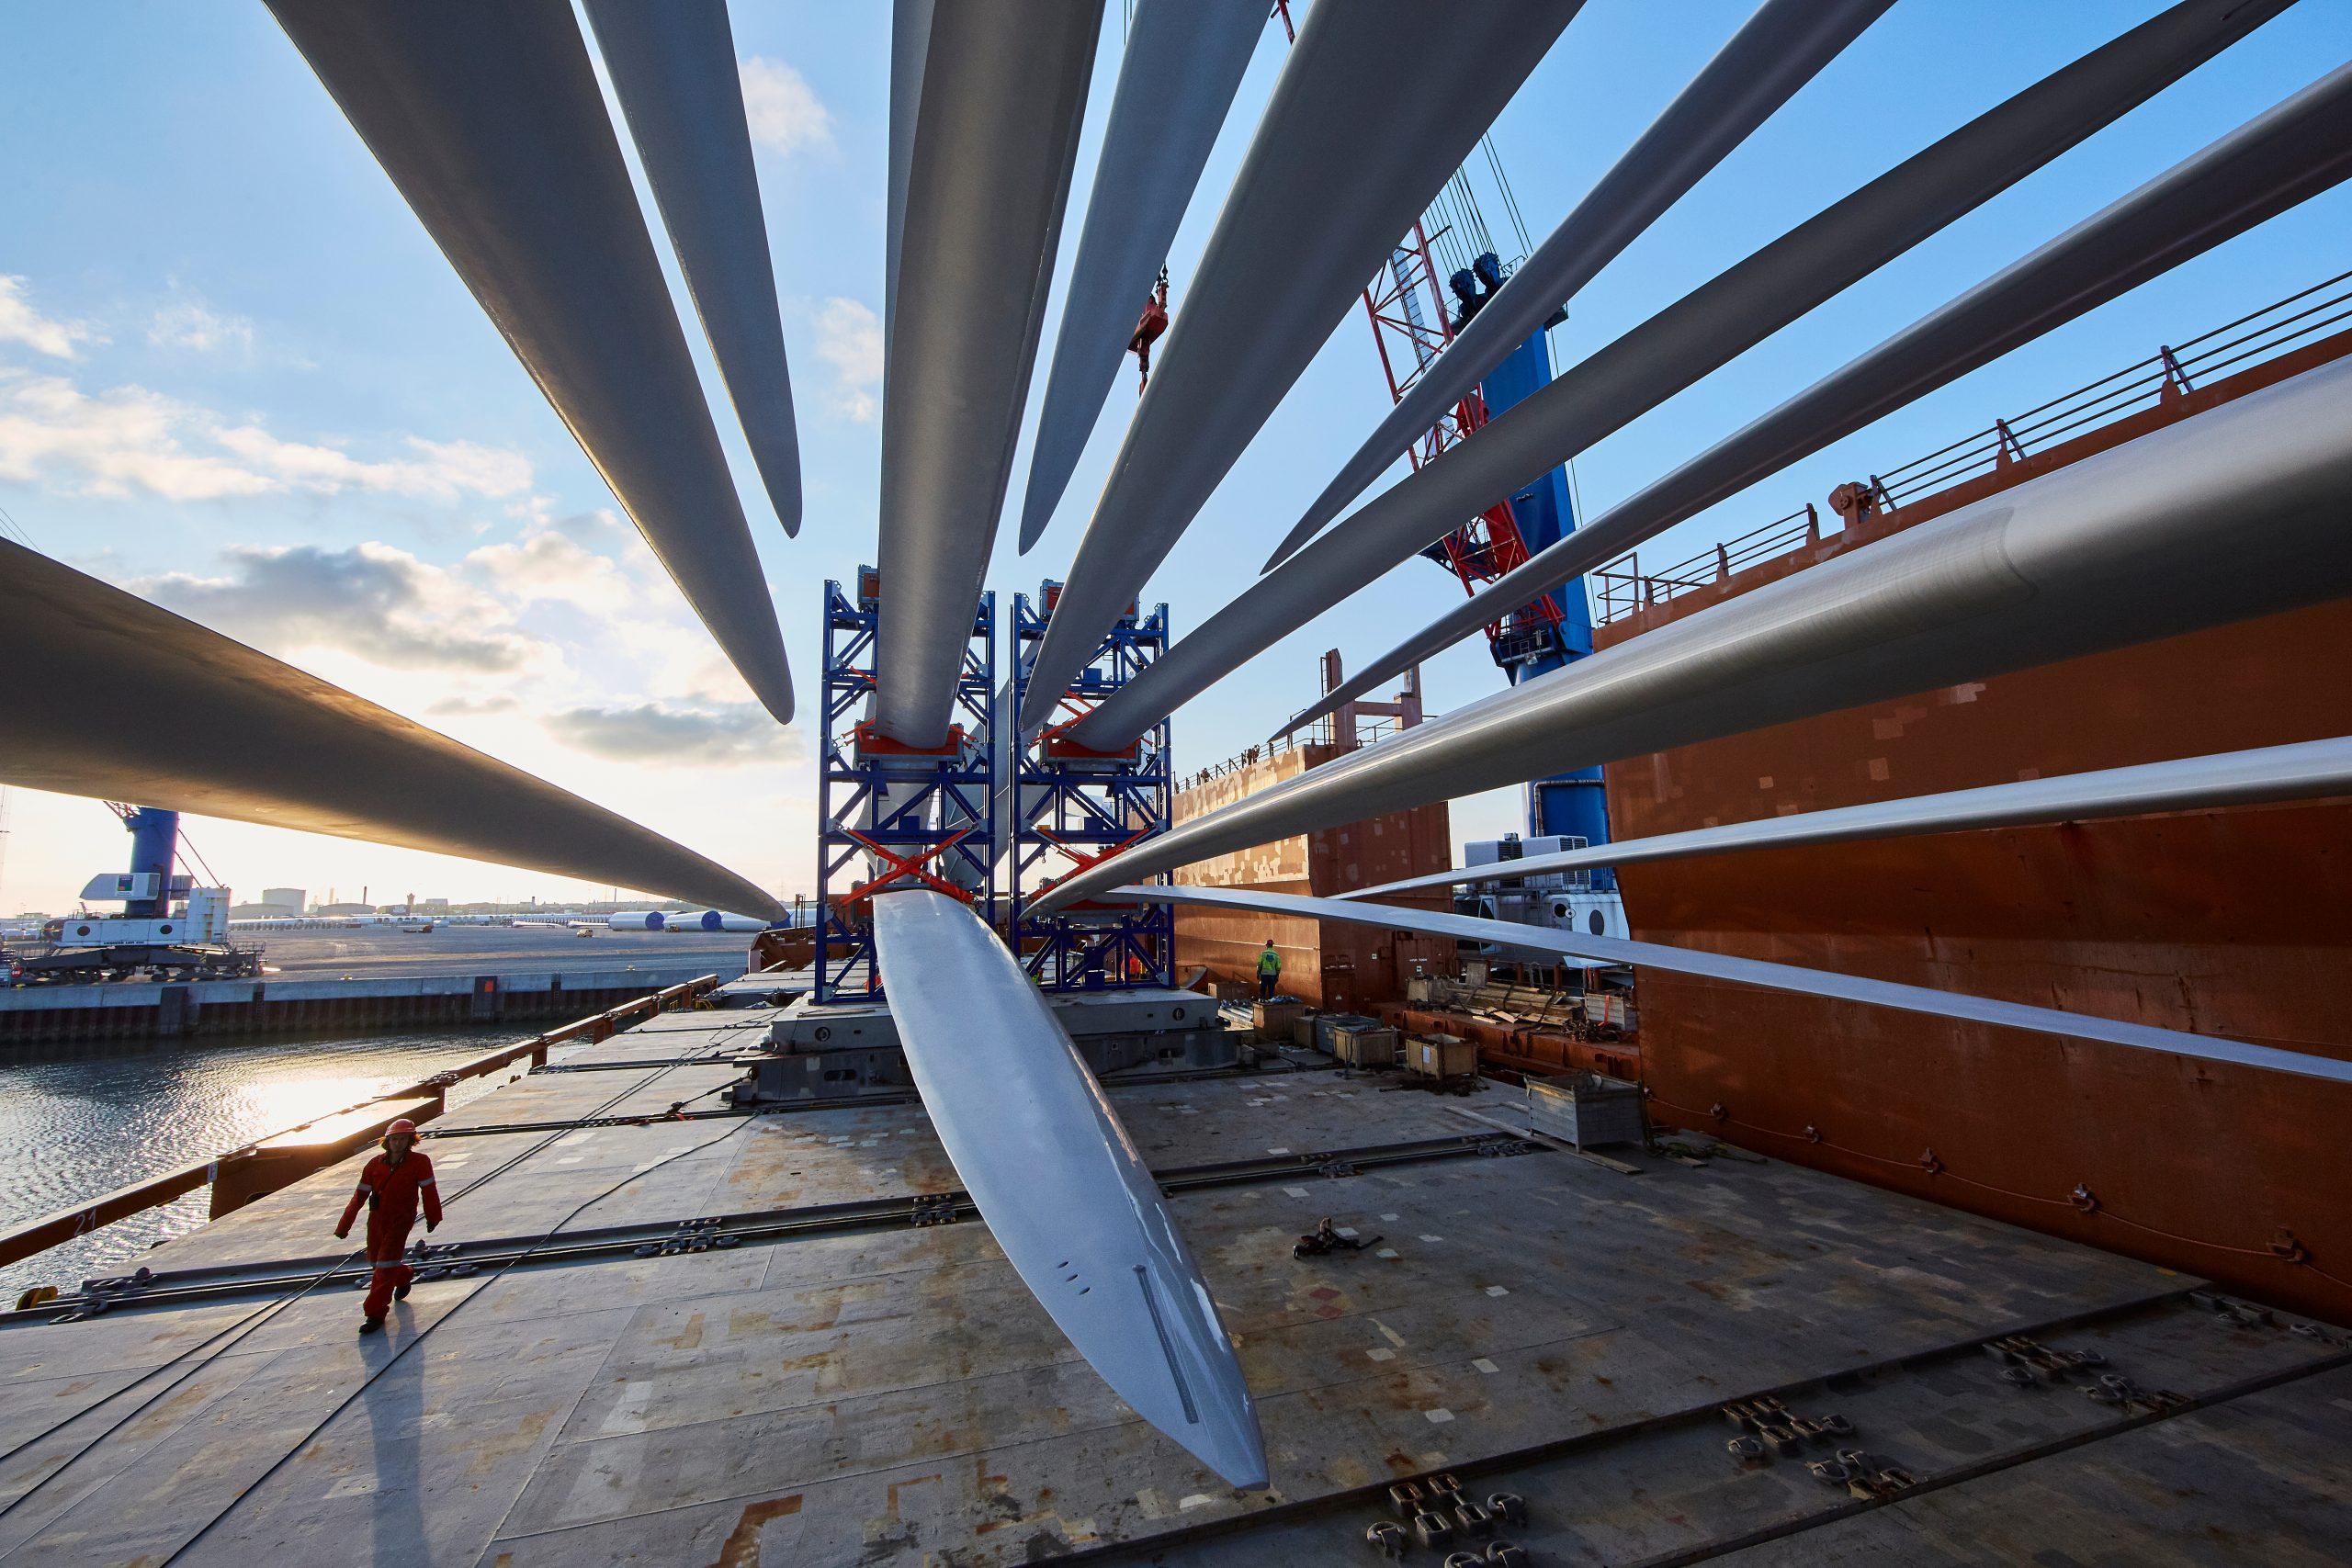 Turbine blades heading for Block Island offshore wind farm.